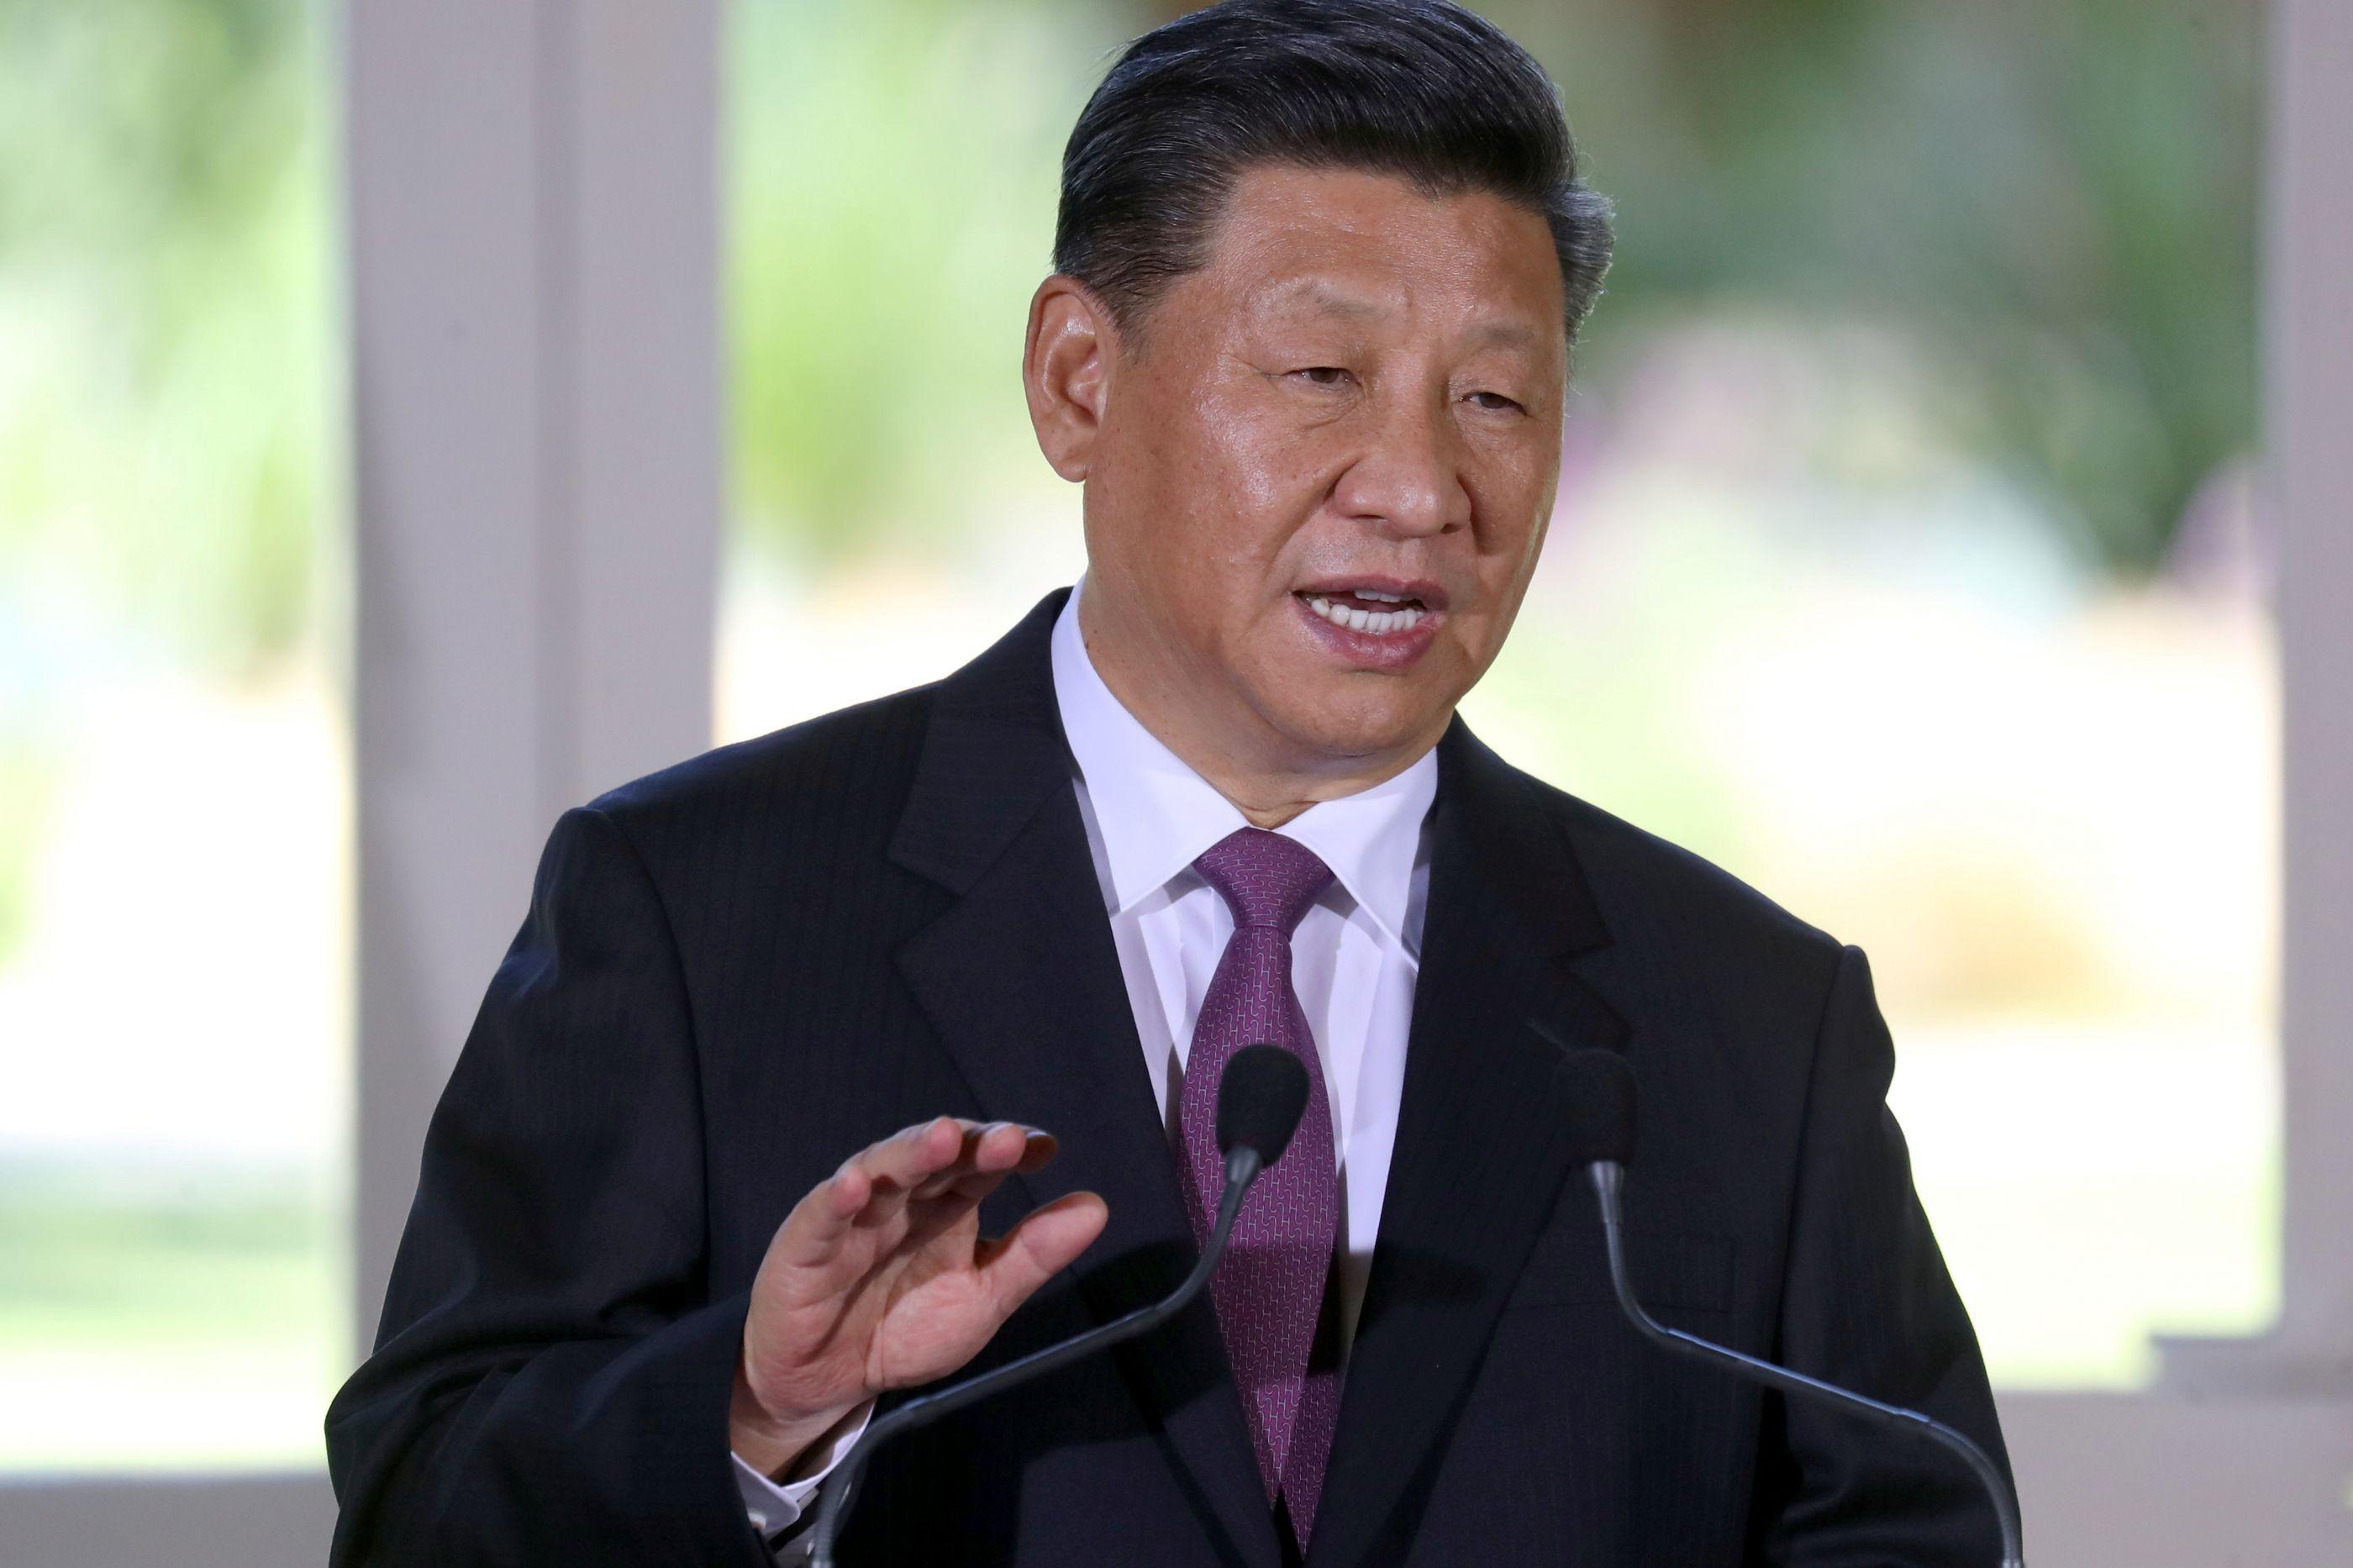 Xi Jinping inicia visita a Lisboa com agenda económica e política